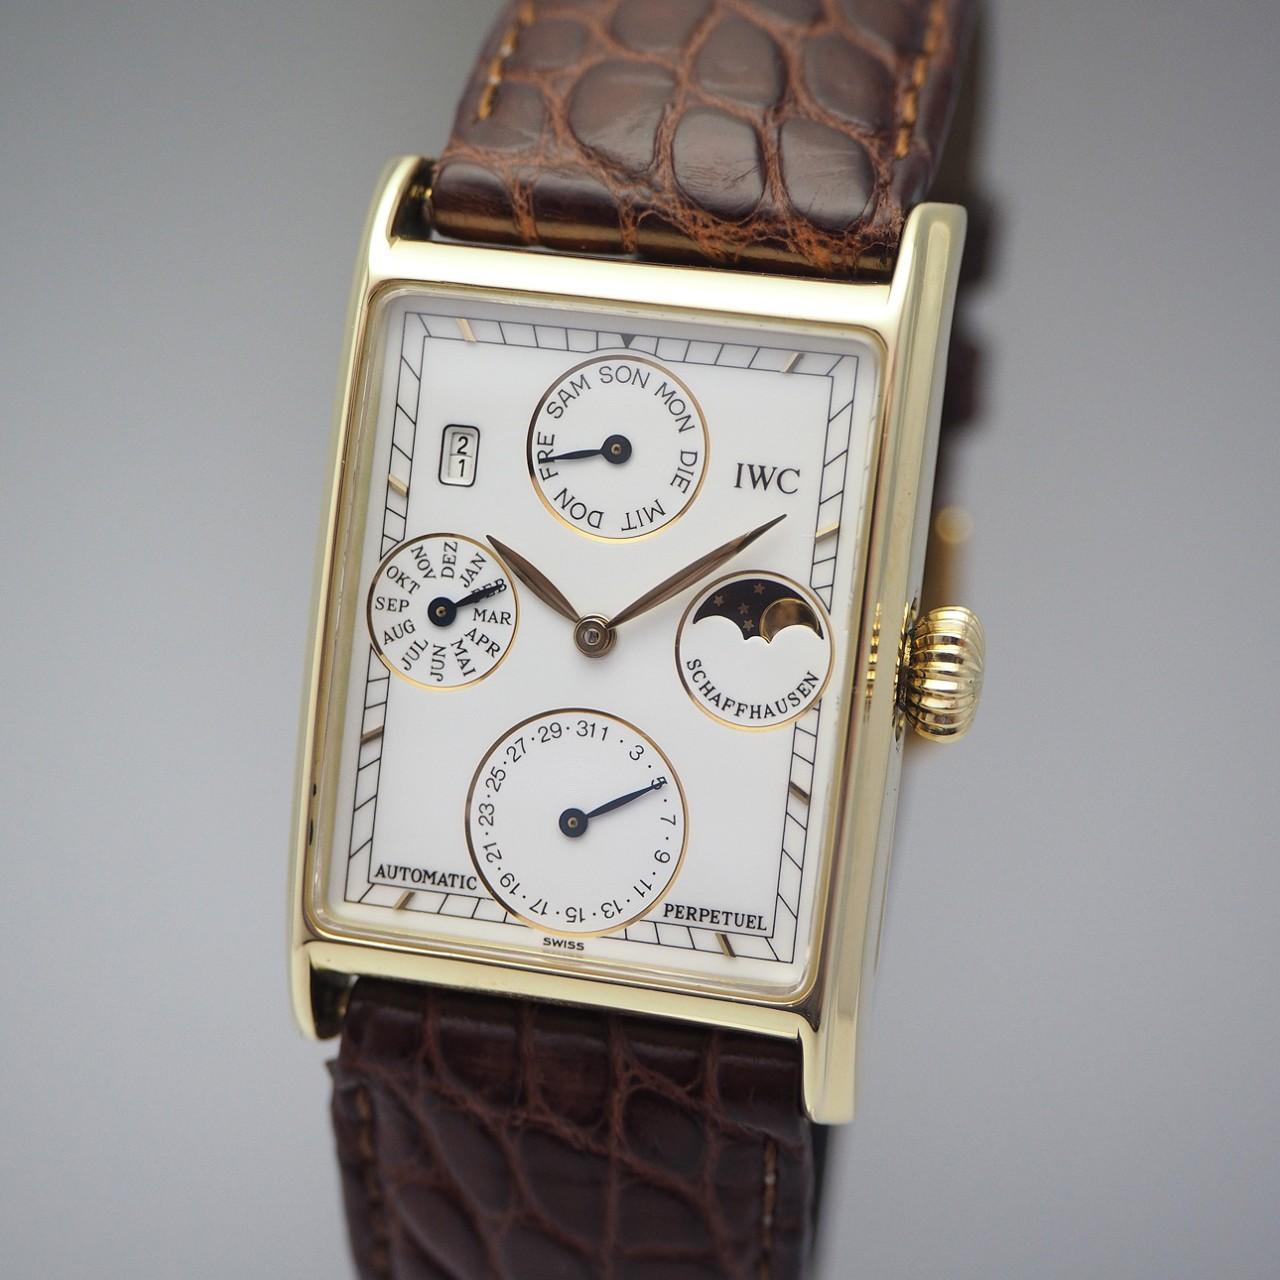 IWC Novecento Automatik/ Perpetual Calendar 3545, Gold 18k/750